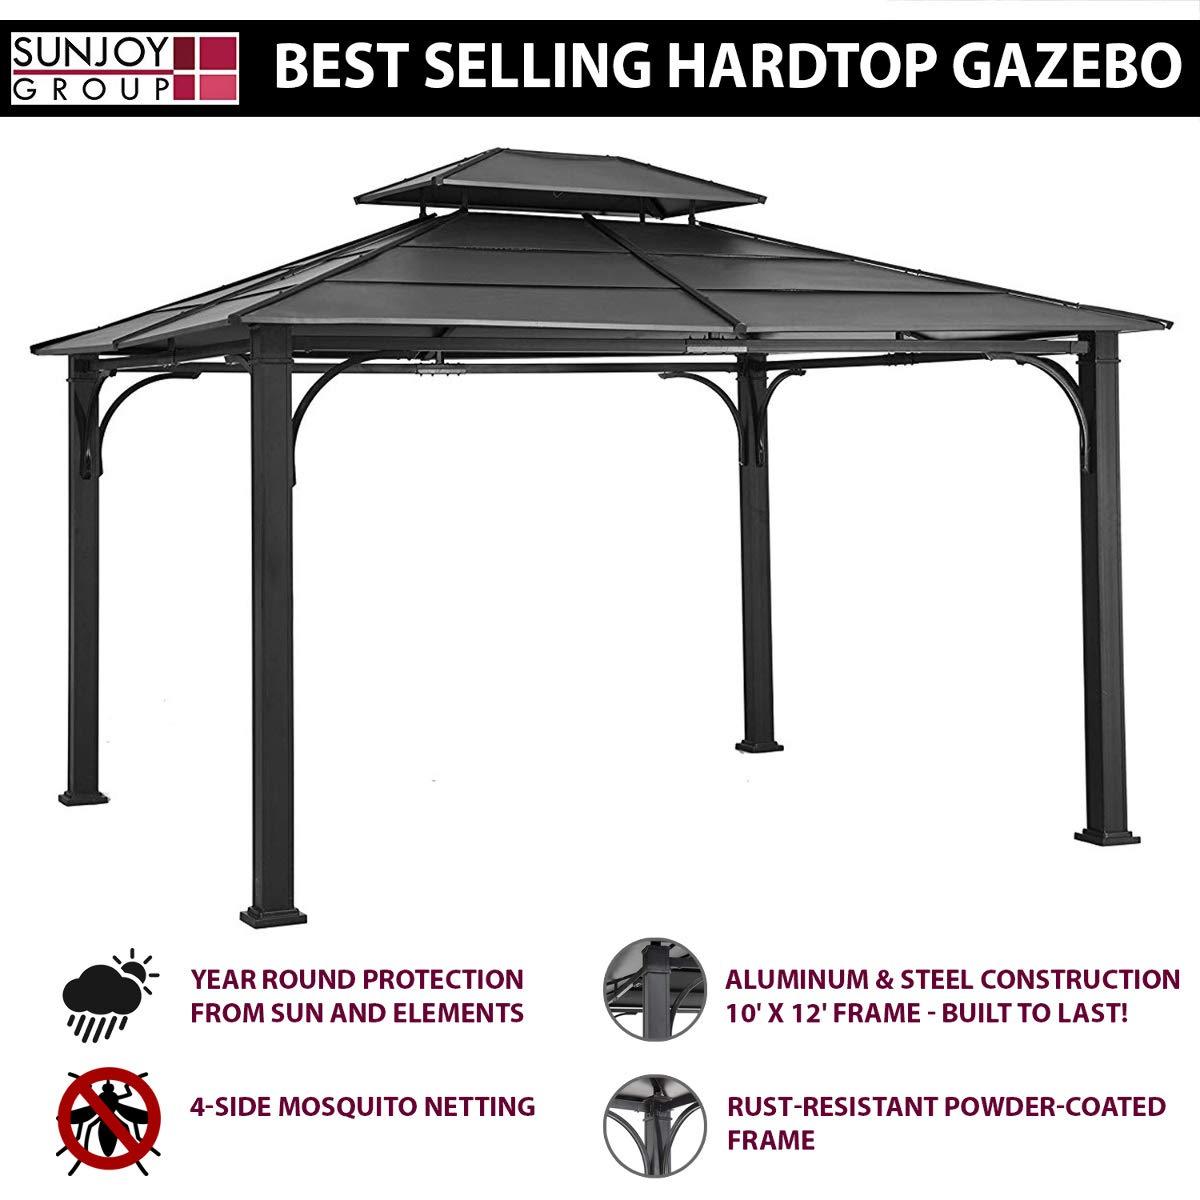 sunjoy 10 x 12 Chatham Steel Hardtop Gazebo